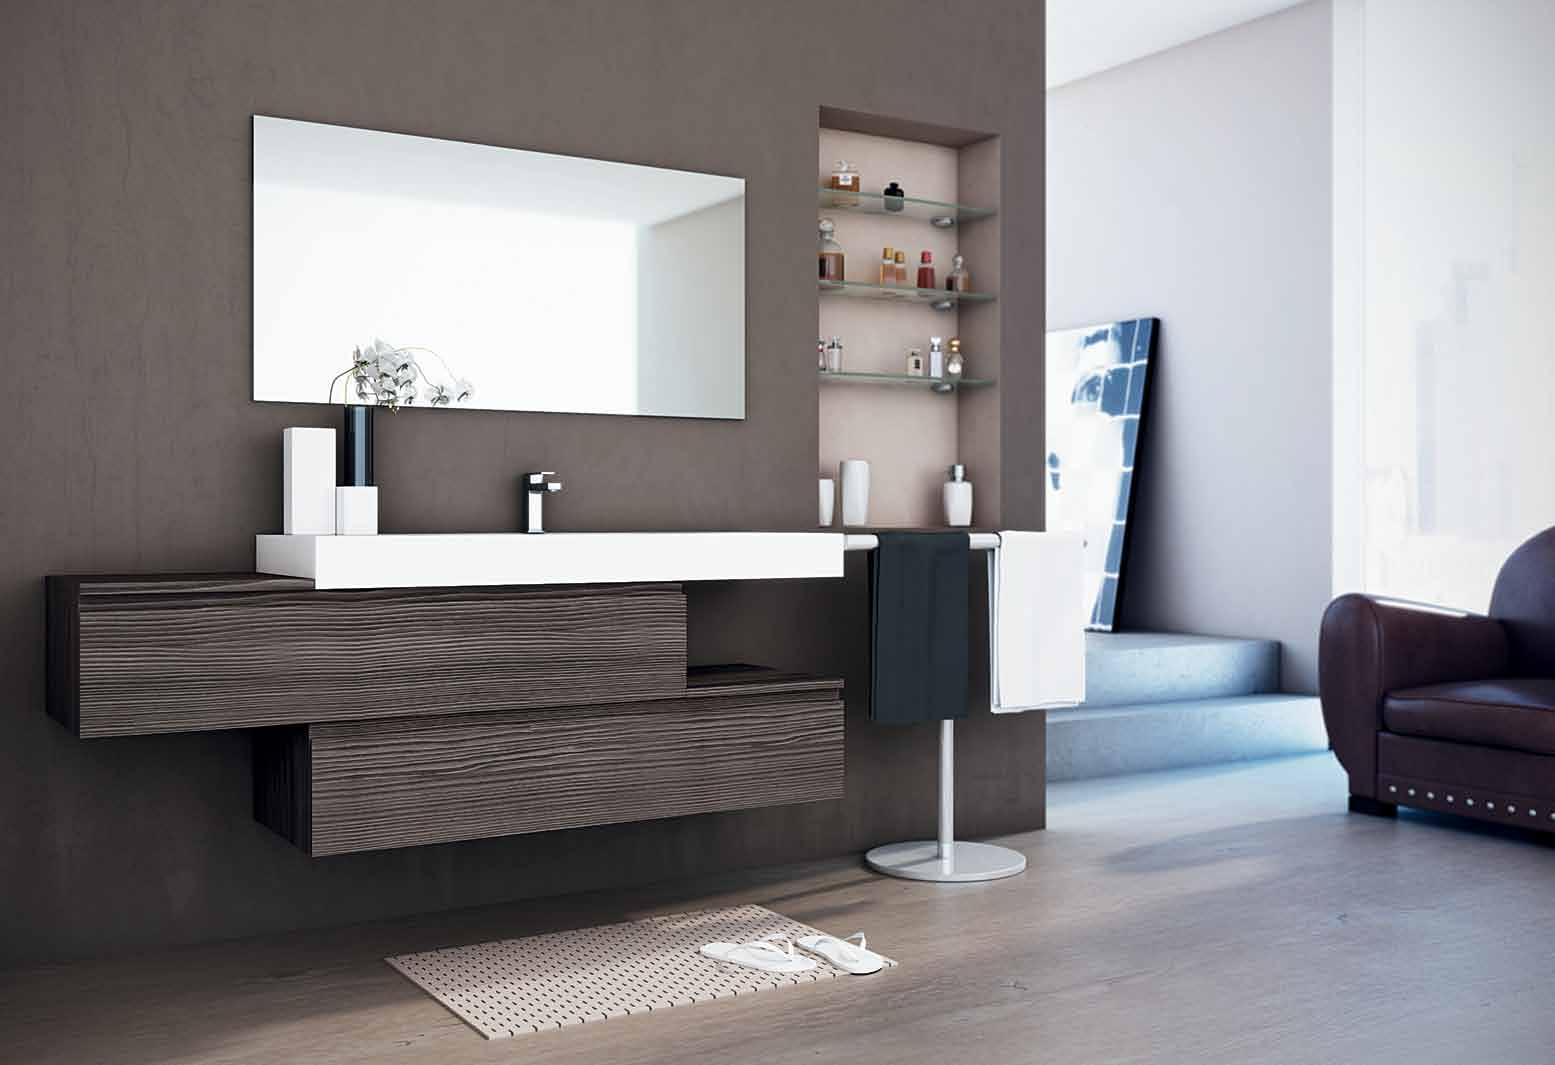 Muebles de ba o para cuartos de ba o elegantes y modernos for Modelos de cuartos de banos modernos